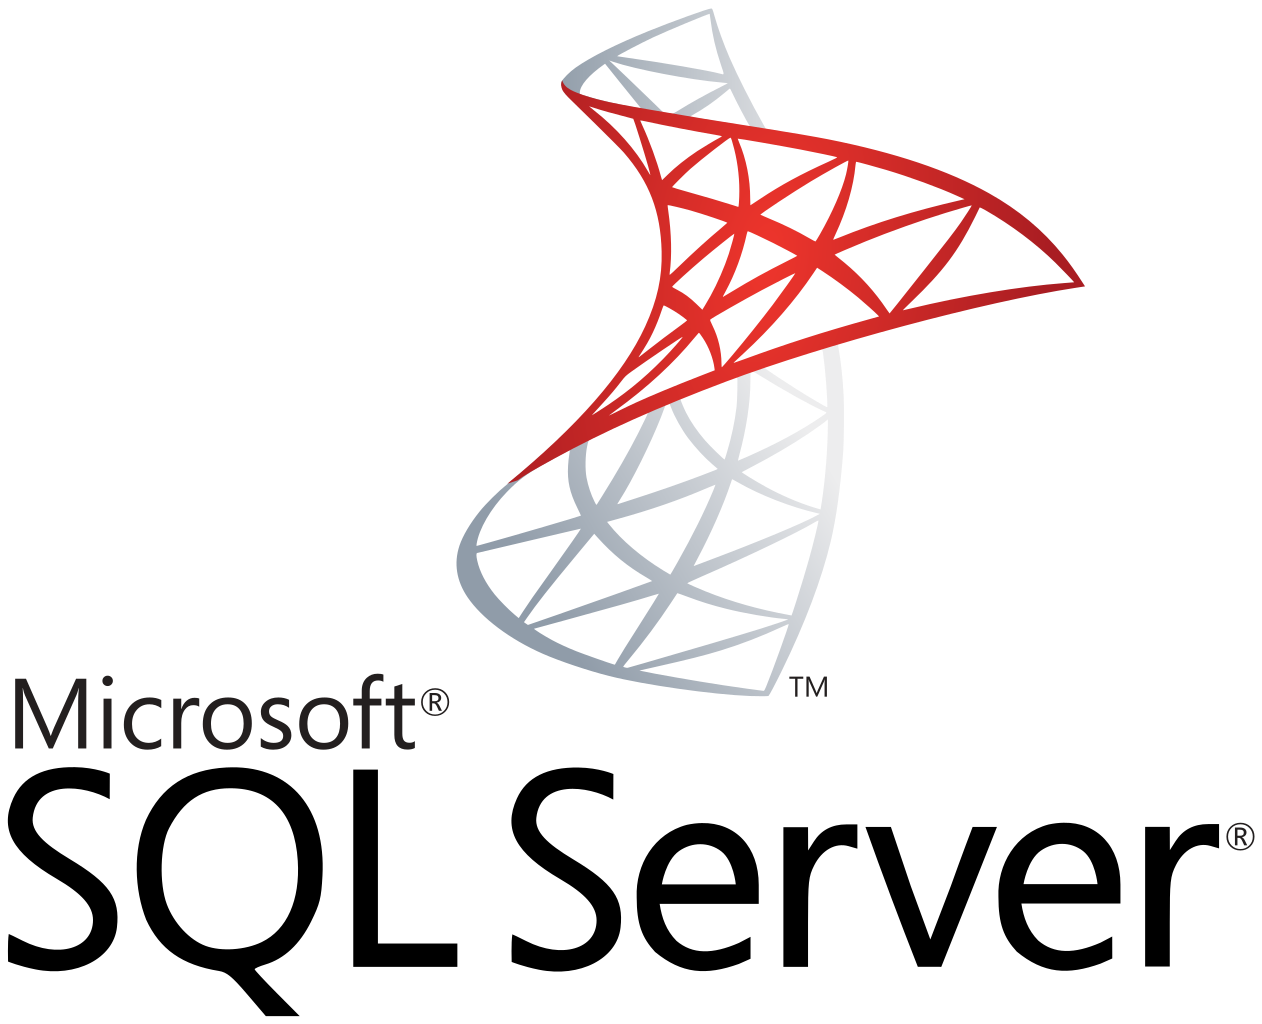 Microsoft SQL Logo Wallpaper